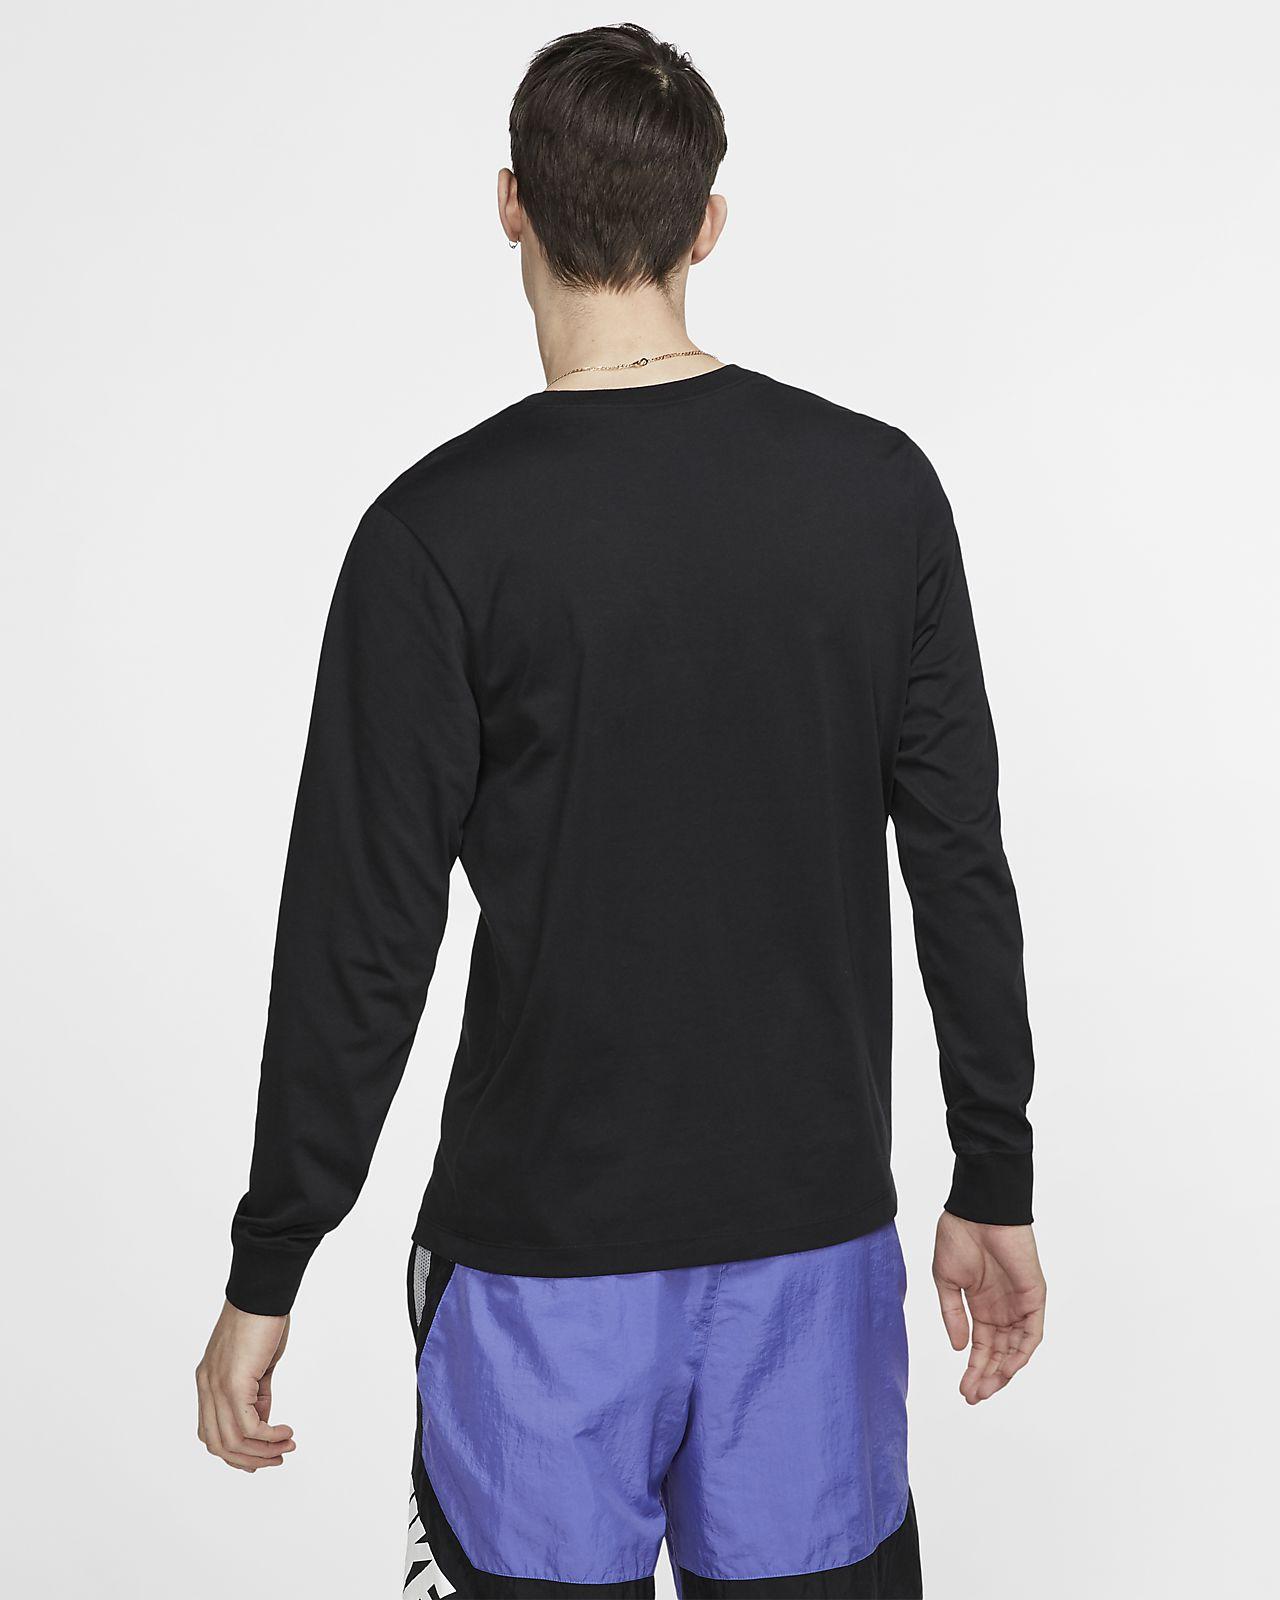 76b707408a3149 Nike Dri-FIT Men s Long-Sleeve Basketball T-Shirt. Nike.com